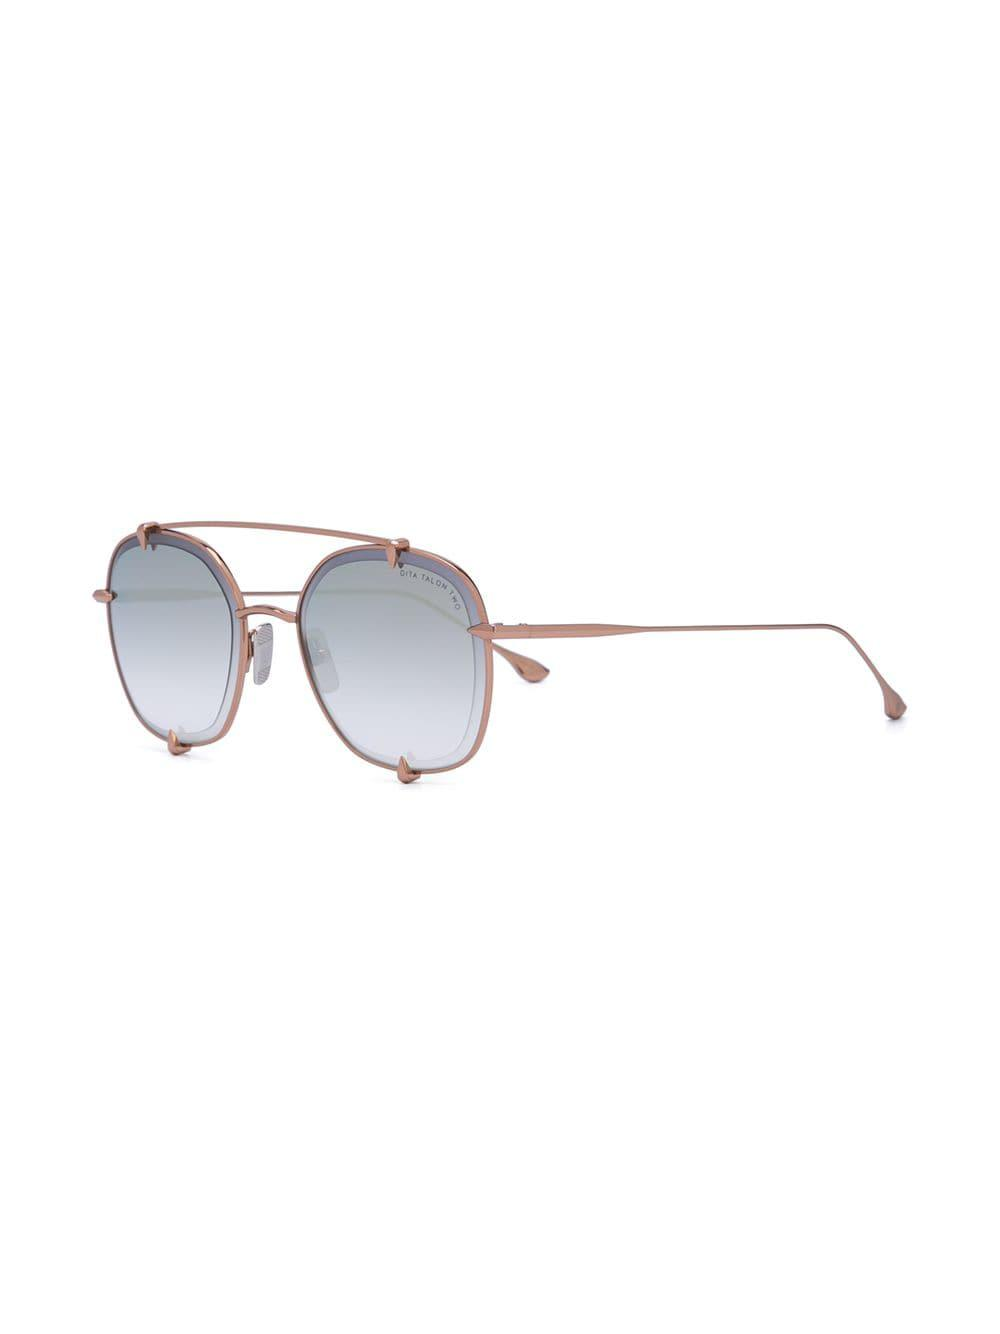 be6aebc99ee Dita Eyewear Double Bridge Sunglasses in Metallic - Lyst